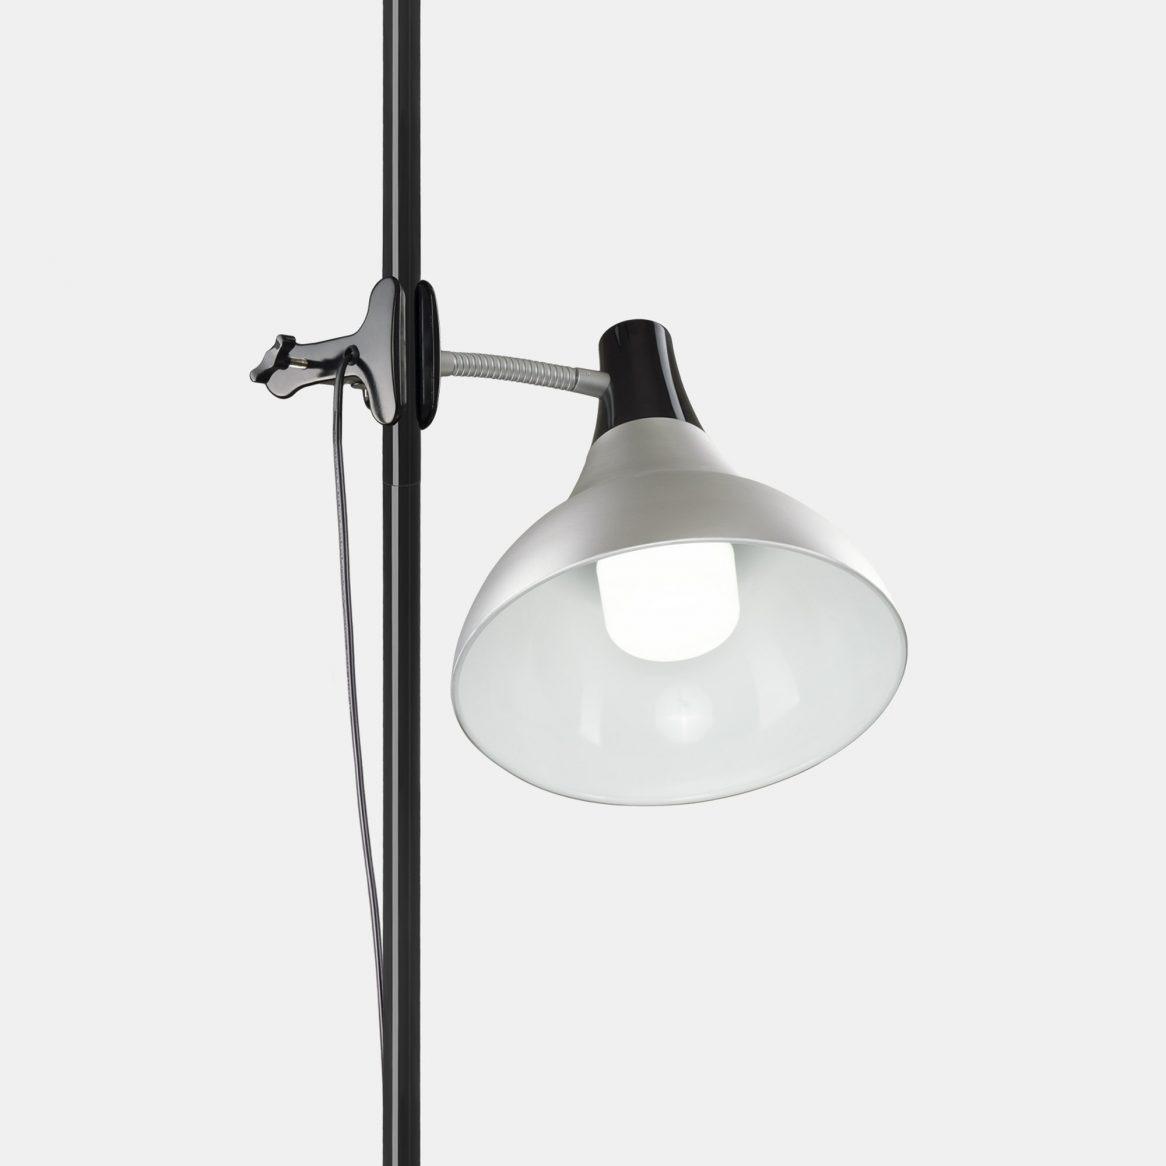 31375 Artist Studio Lamp + Stand